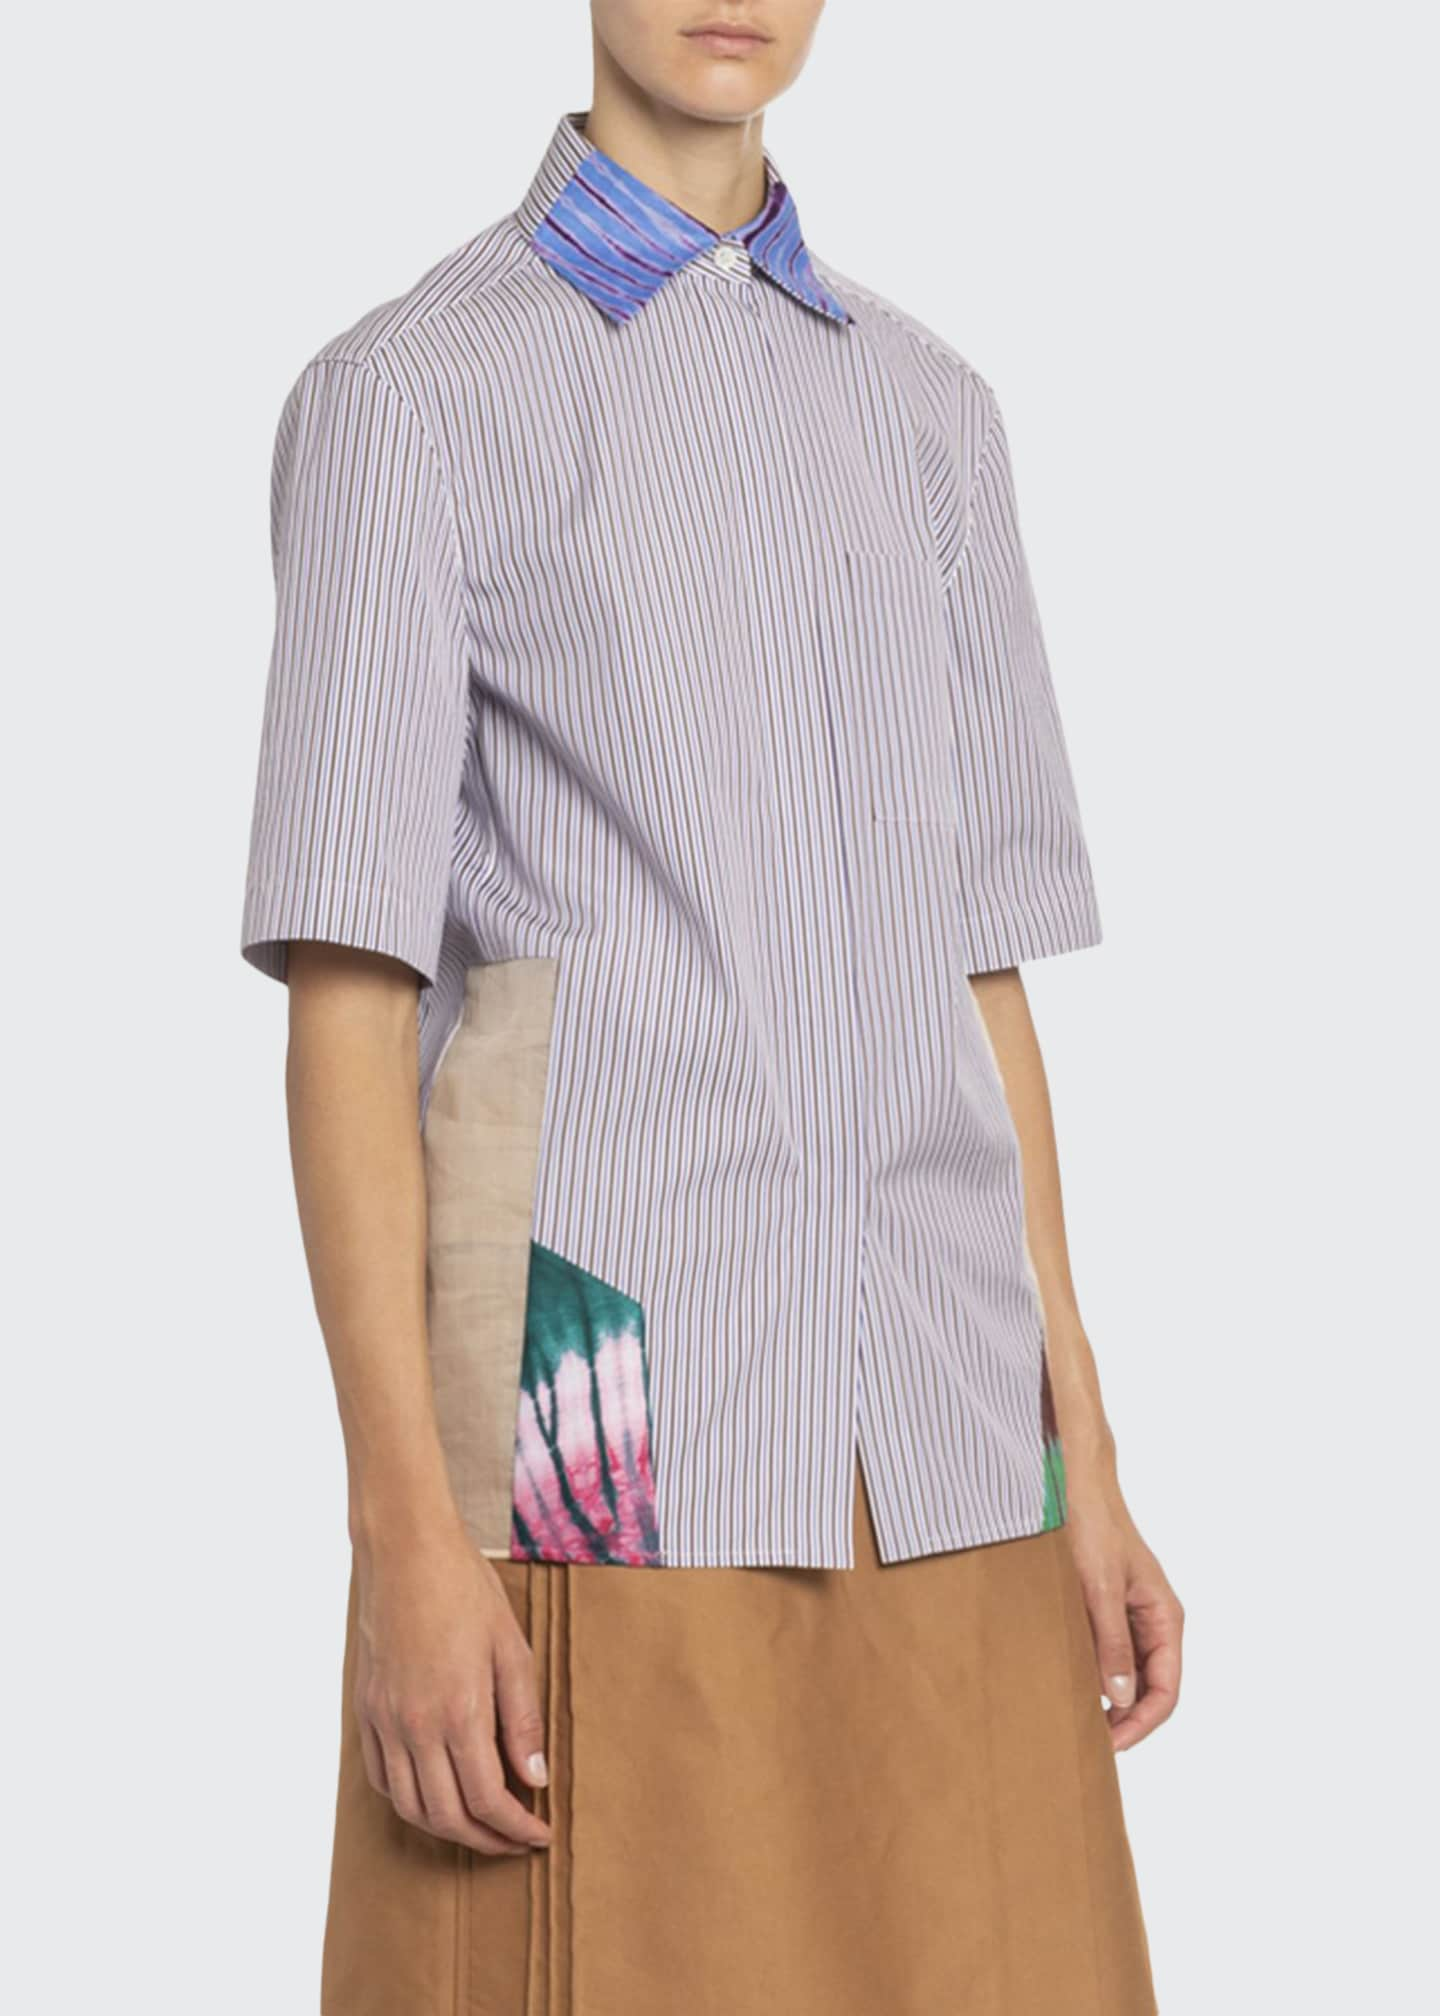 Boon The Shop Artisanal-Patchwork Striped Short-Sleeve Shirt